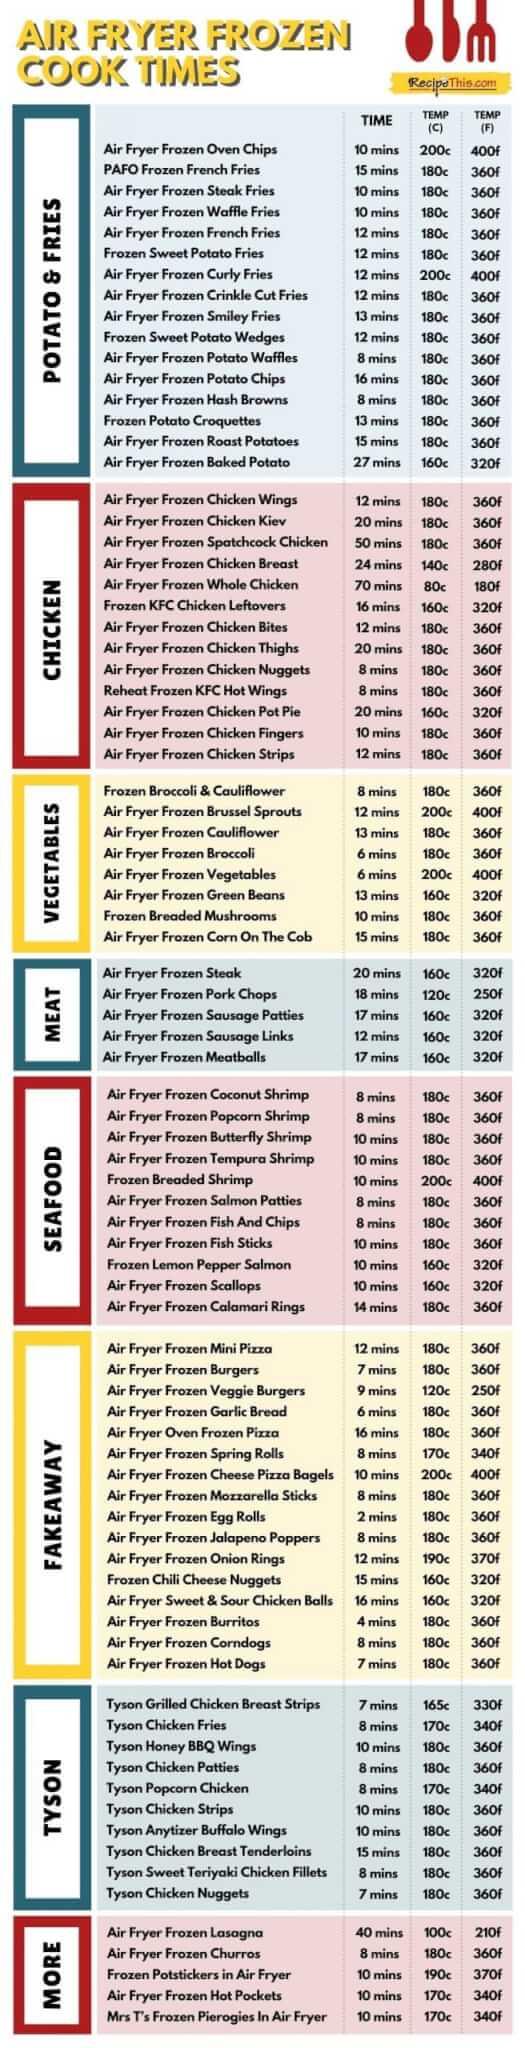 air-fryer-frozen-food-cook-times updated